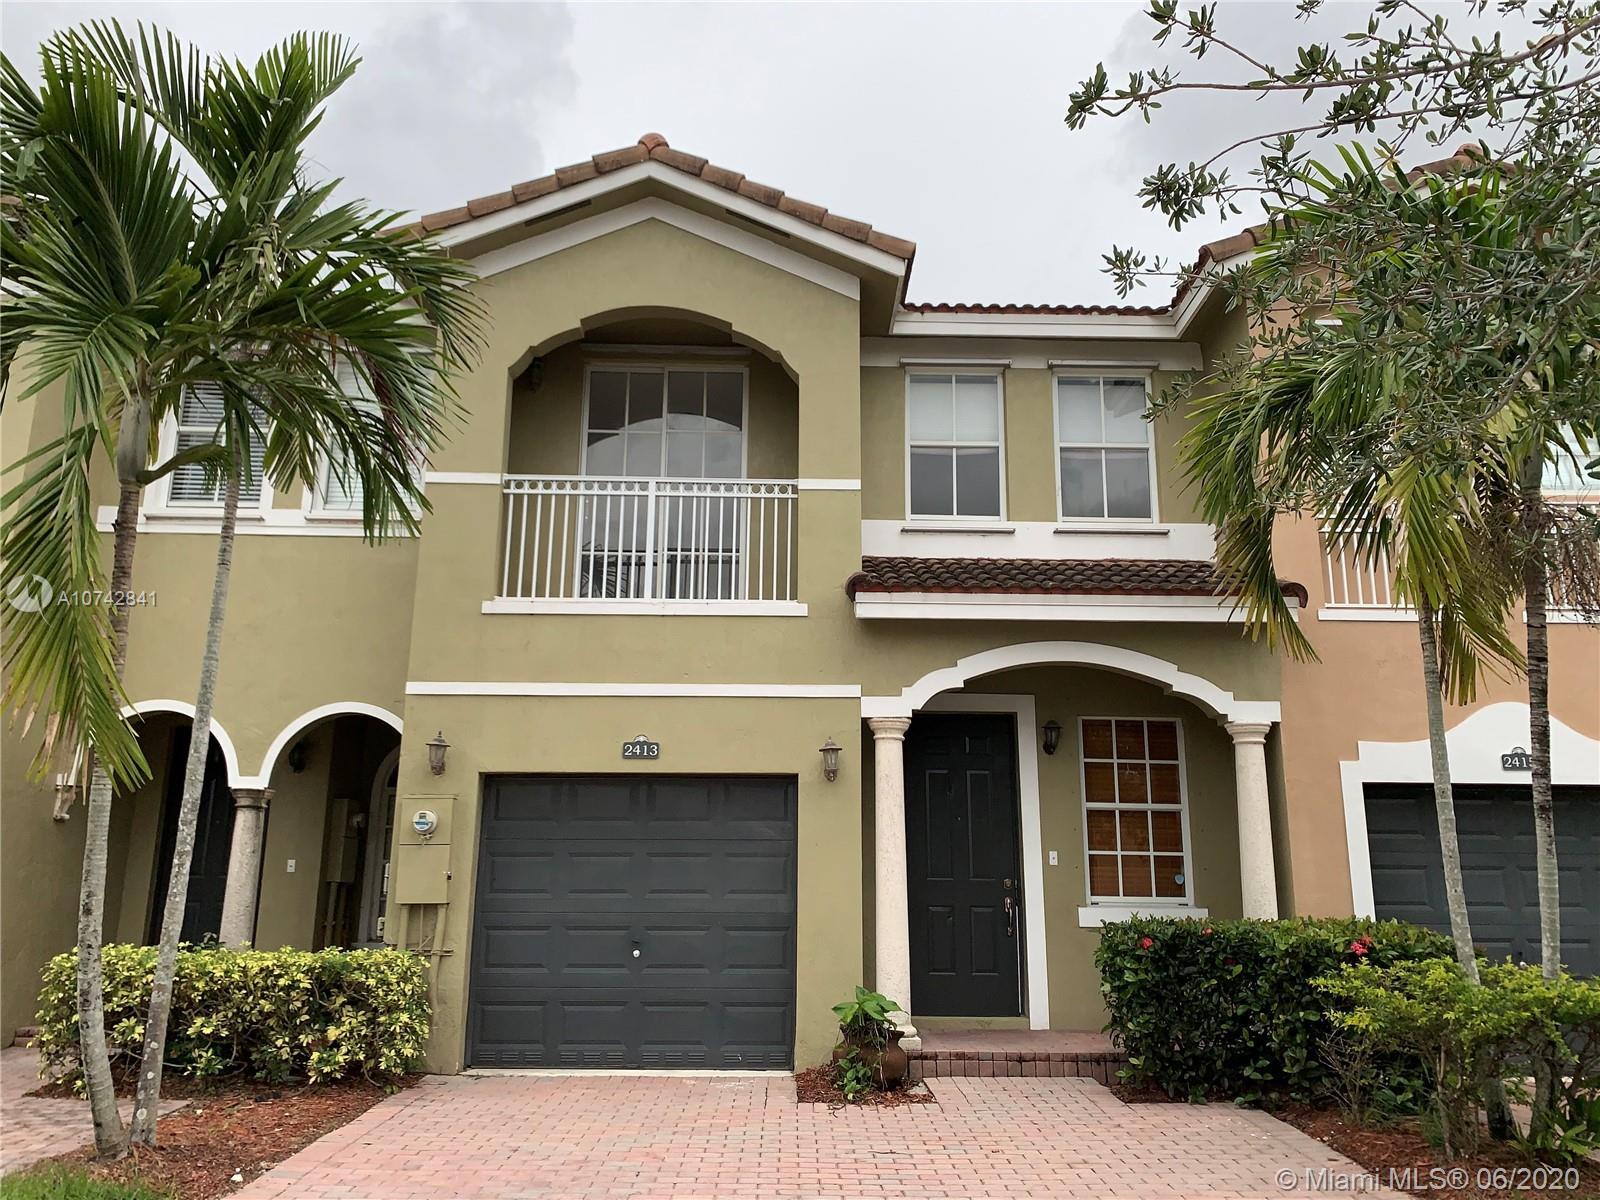 2413 SE 14th St #-, Homestead, FL 33035 - Homestead, FL real estate listing